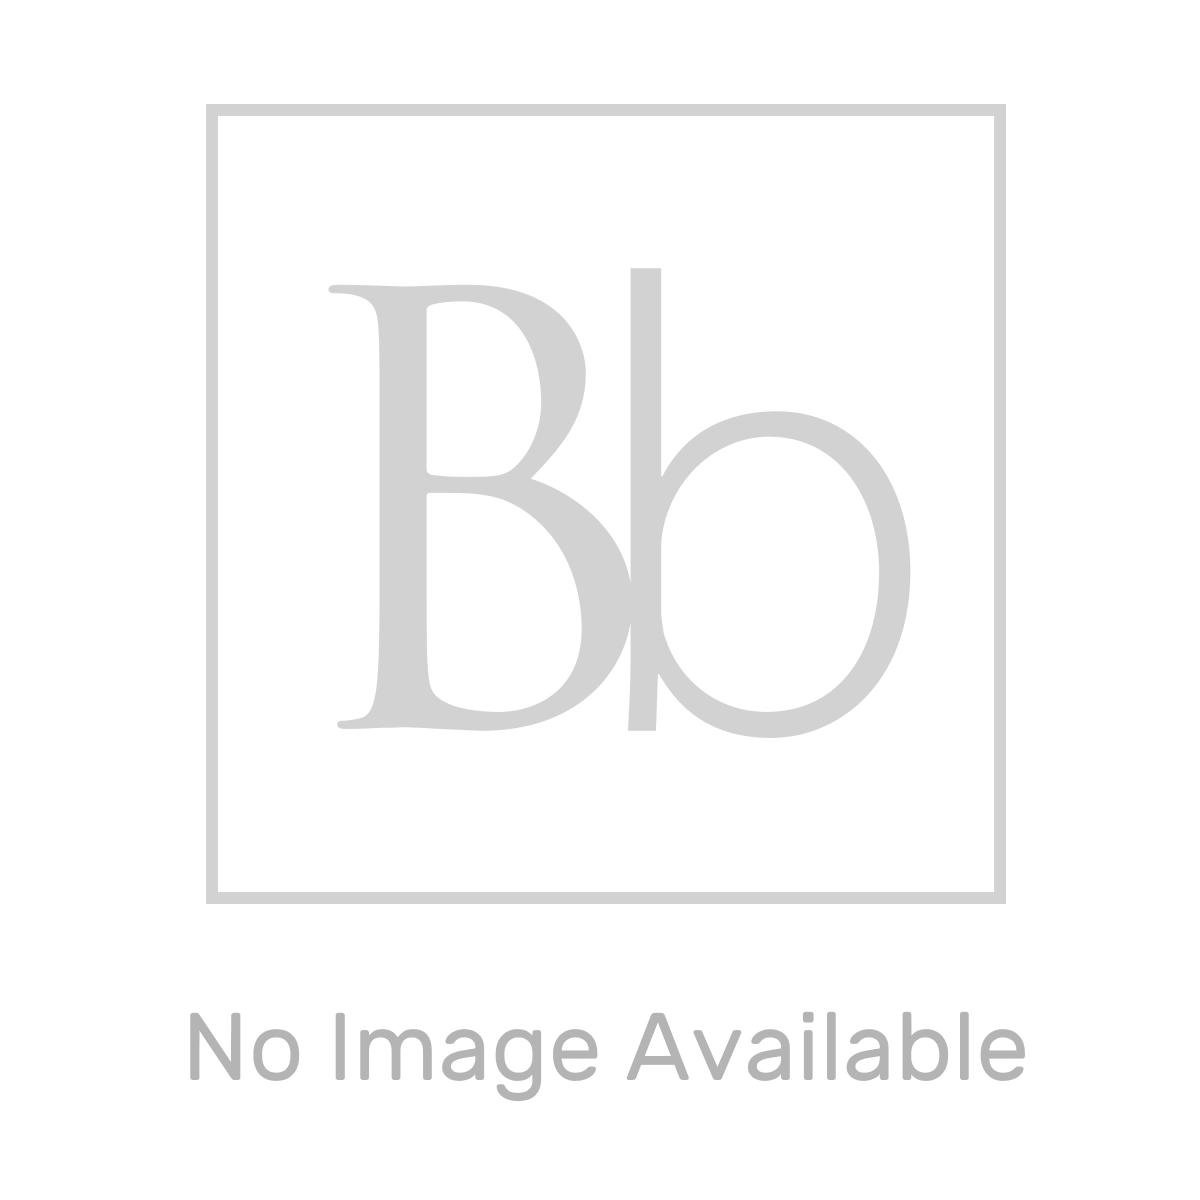 RAK Maremma Dark Brown Matt Tile 750 x 750mm